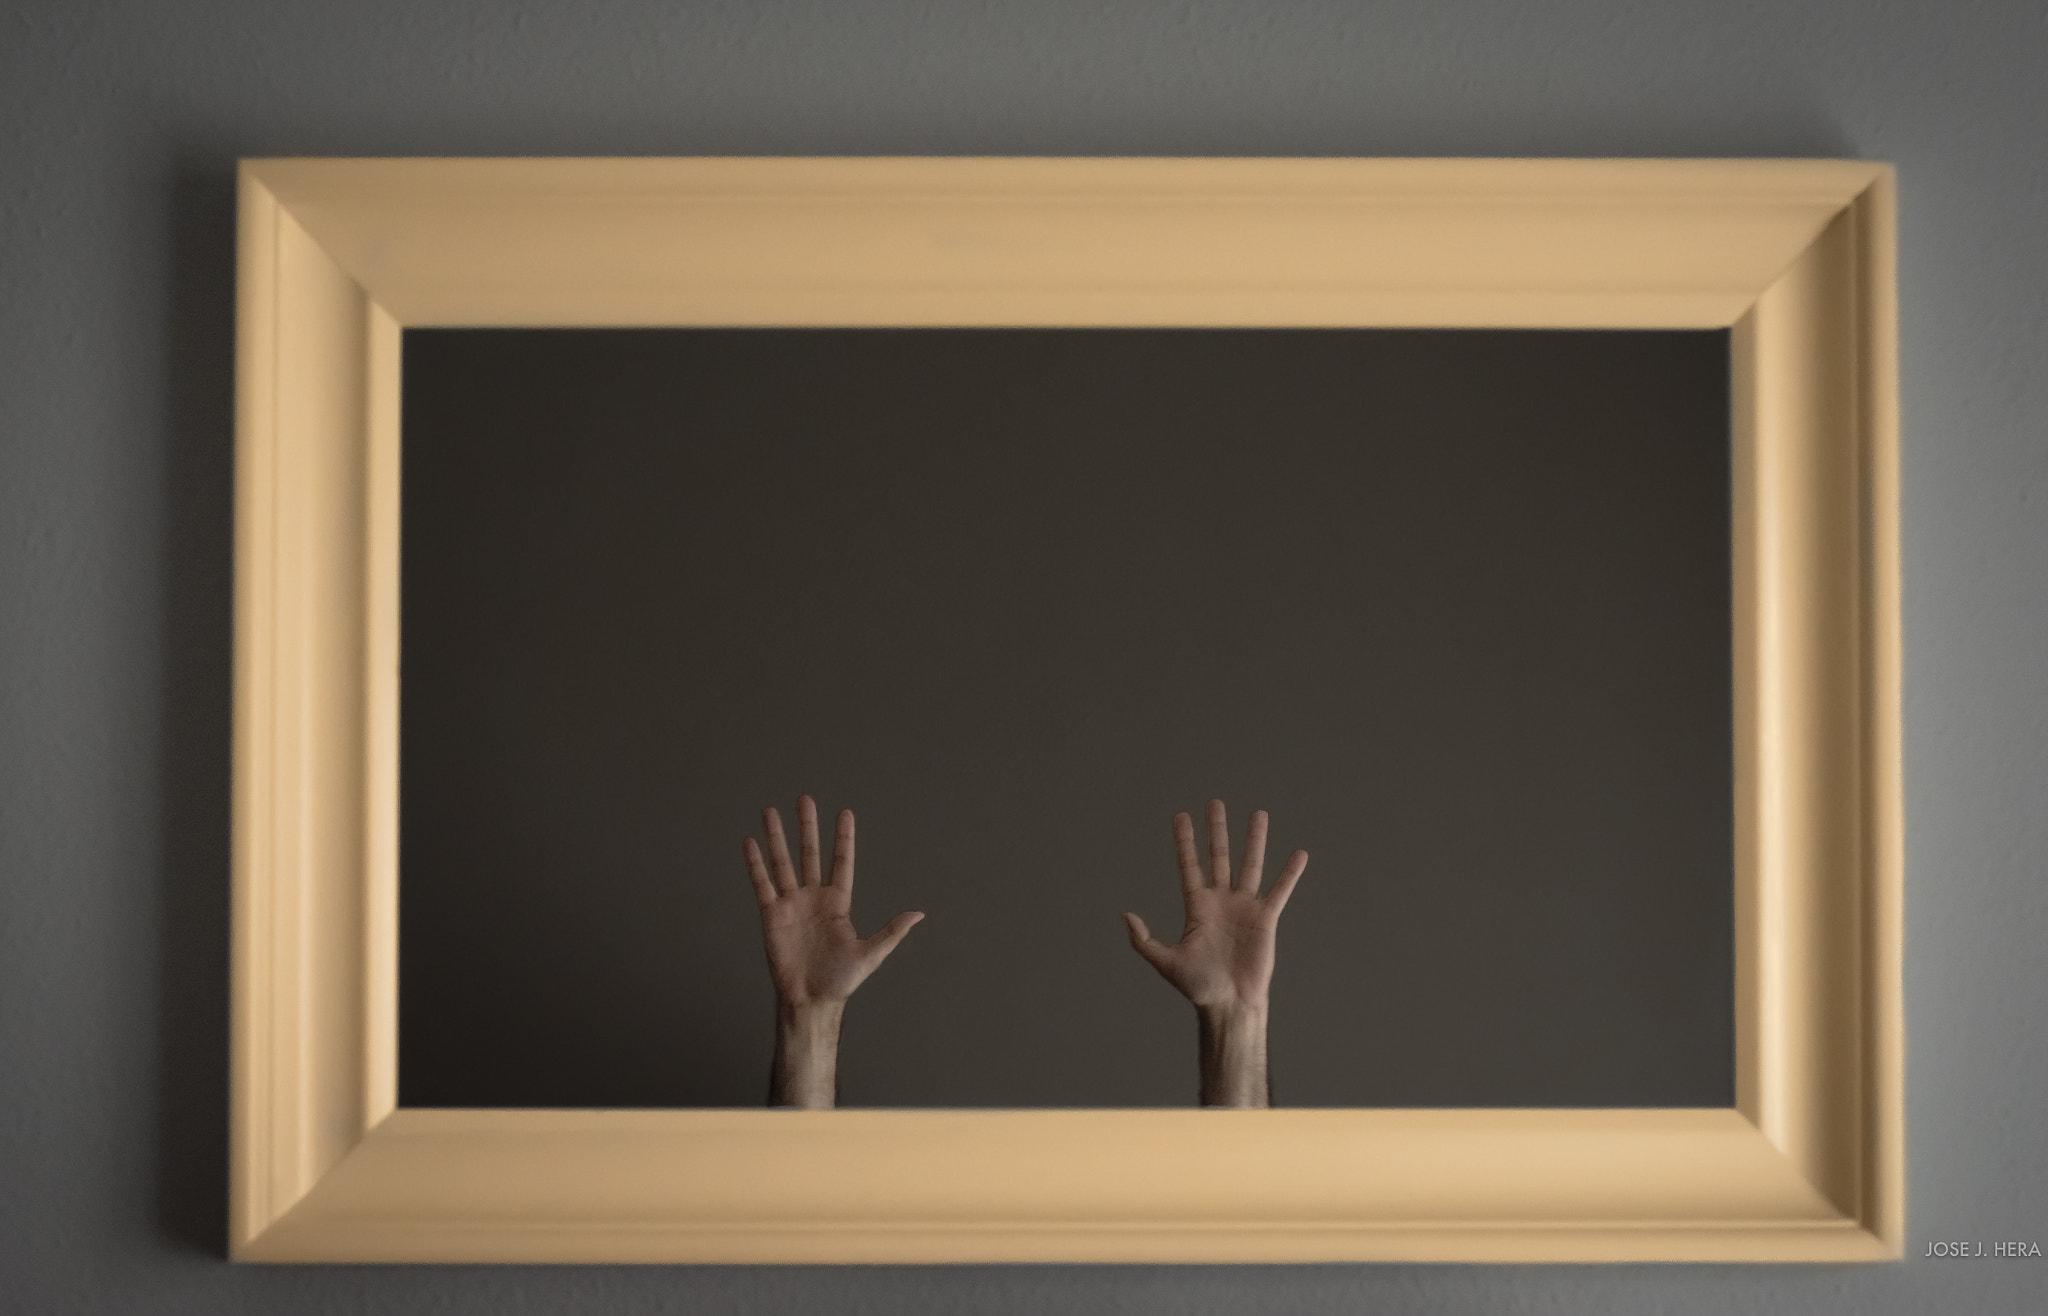 Hands. #stayathome.